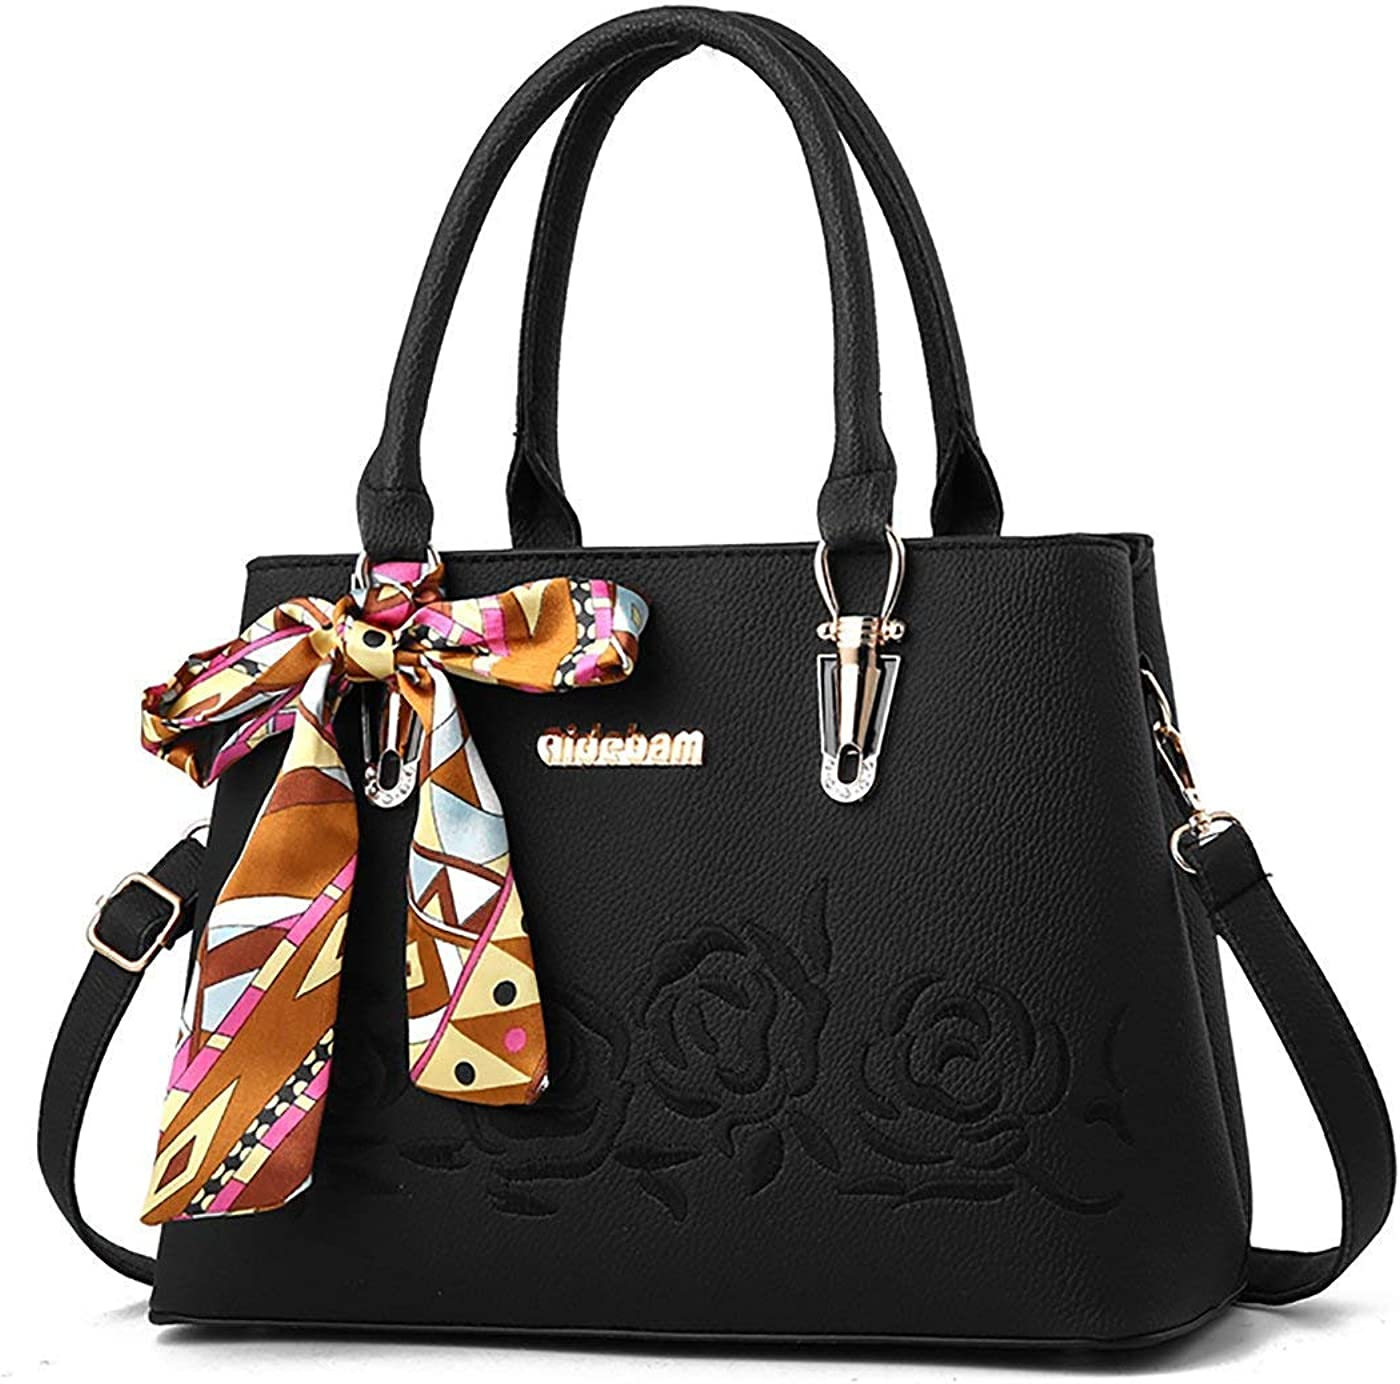 Zhao Liang Women Handbag PU Leather Embroidered Purse Elegant Top Handle Bag Shoulder Bags Satchel Ladies